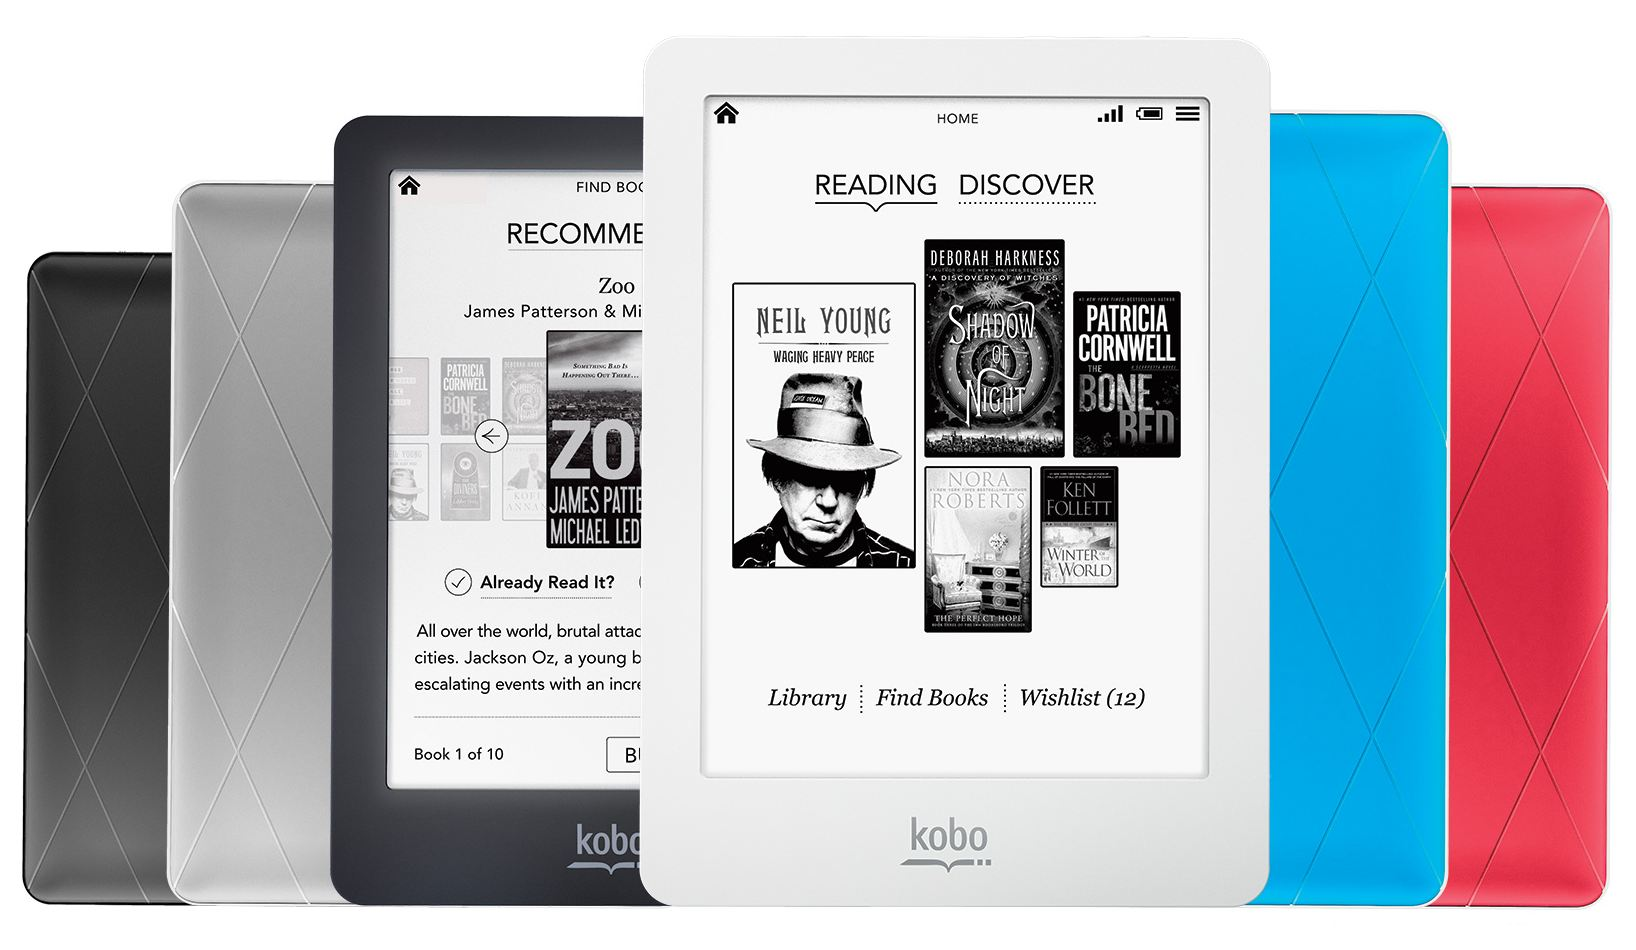 'Groei e-books tot stilstand gekomen'